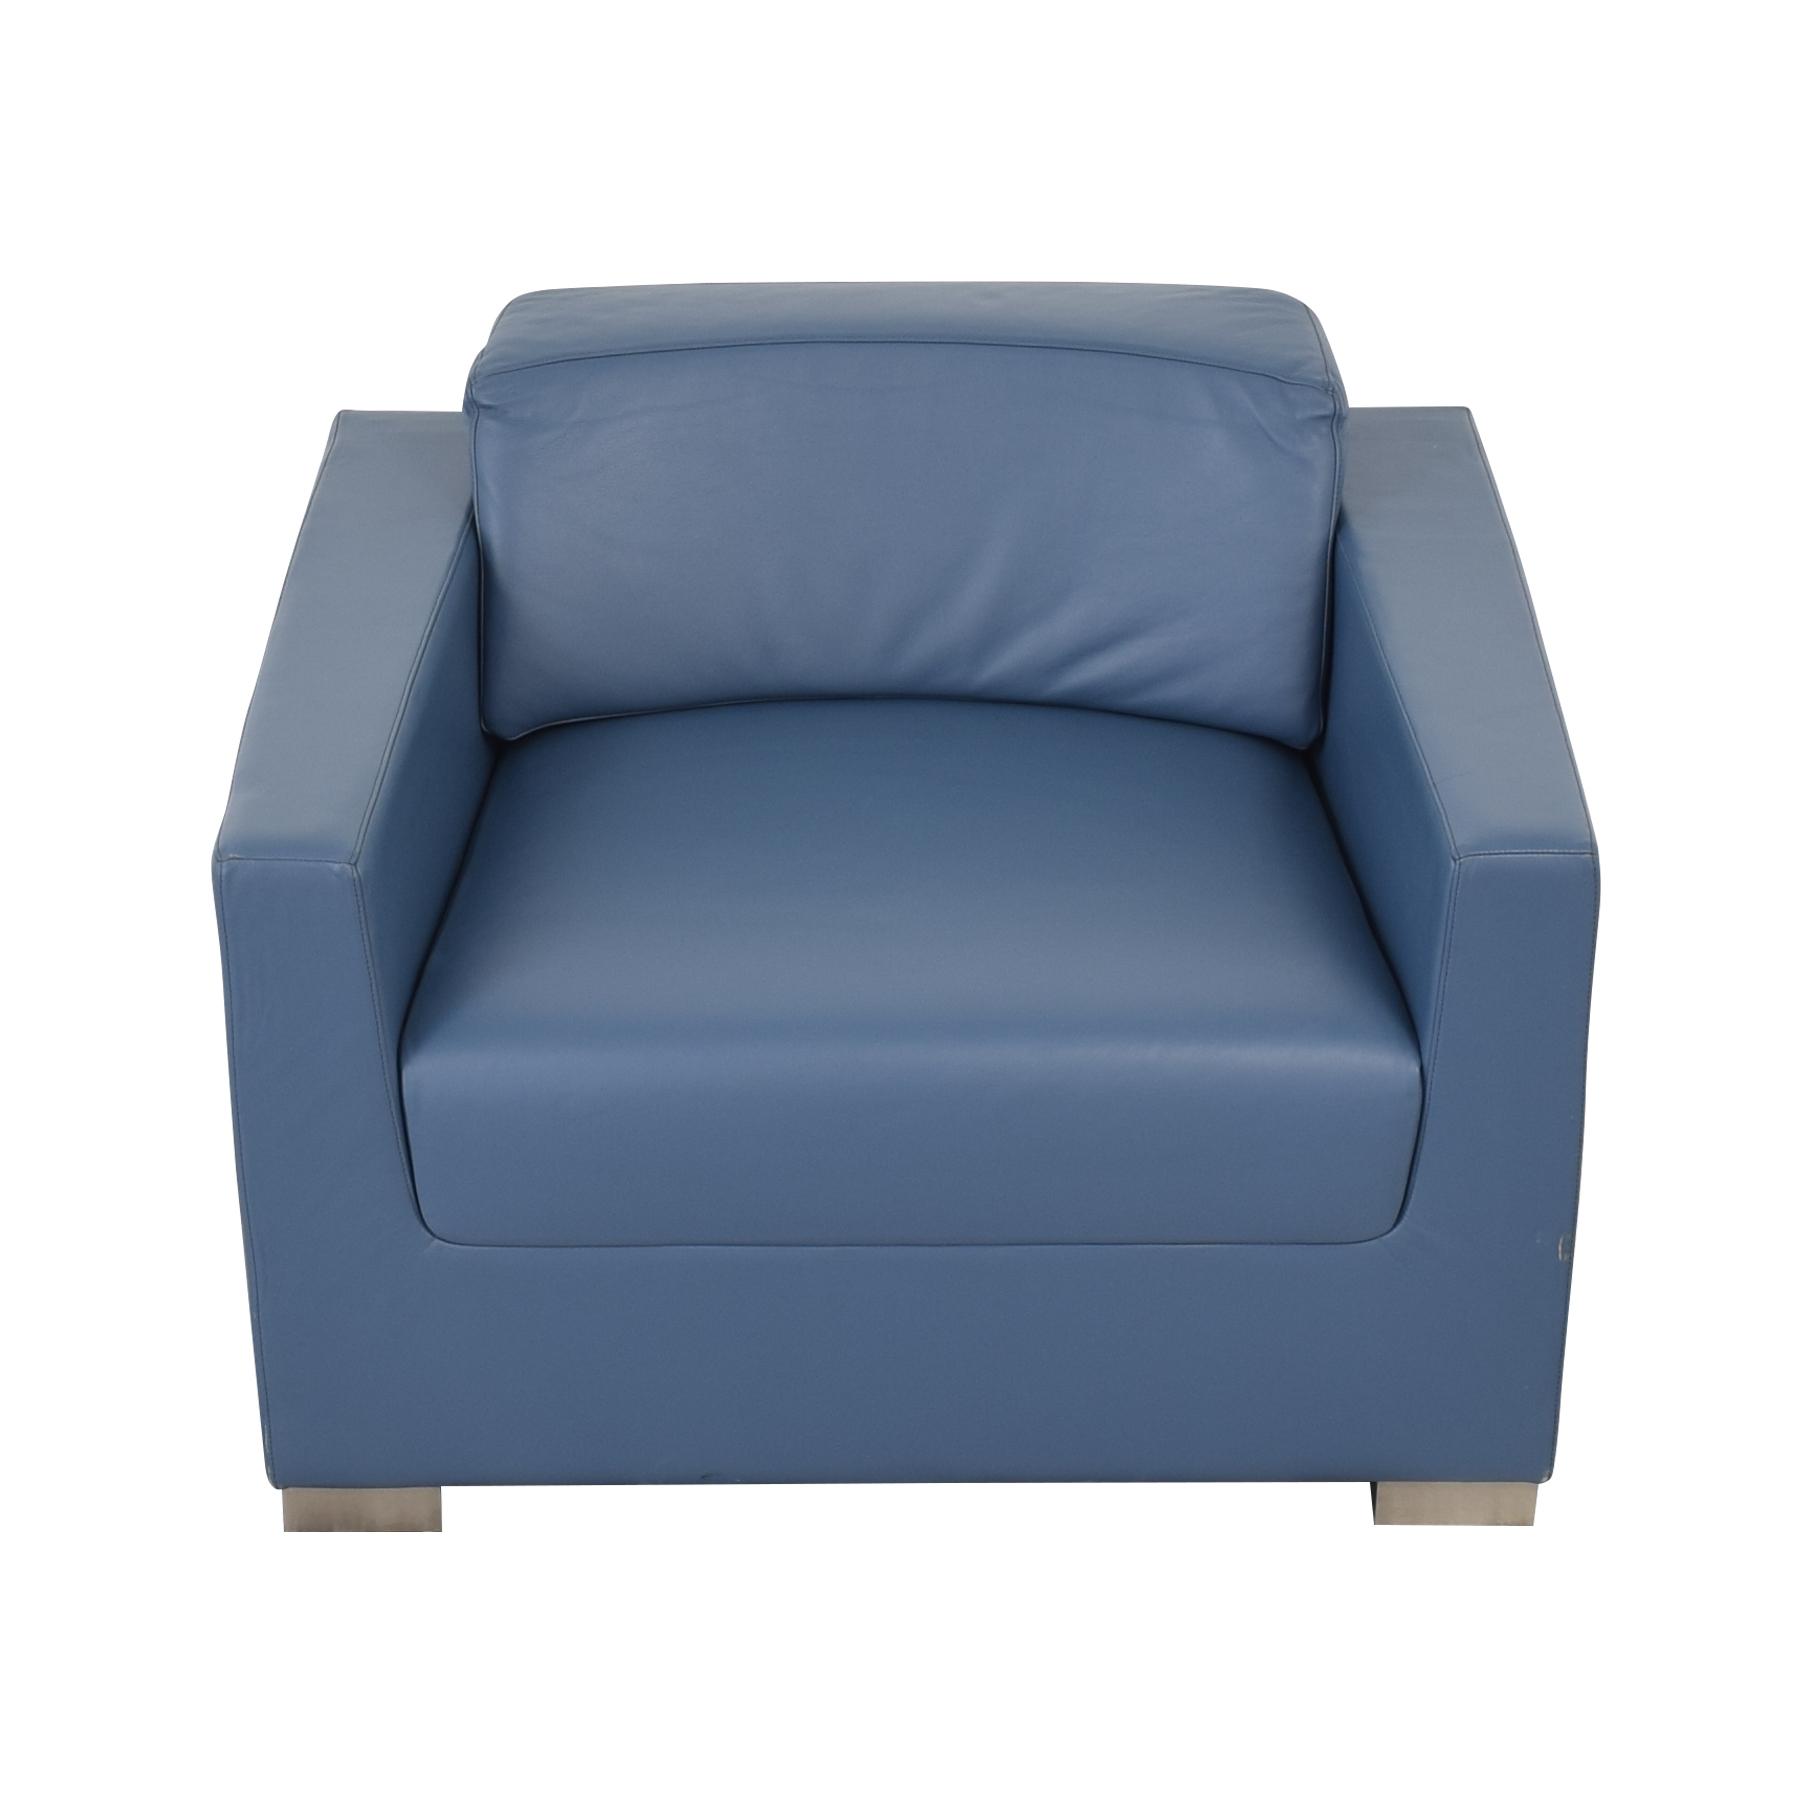 Bernhardt Bernhardt Design Blue Leather Arm Chair coupon